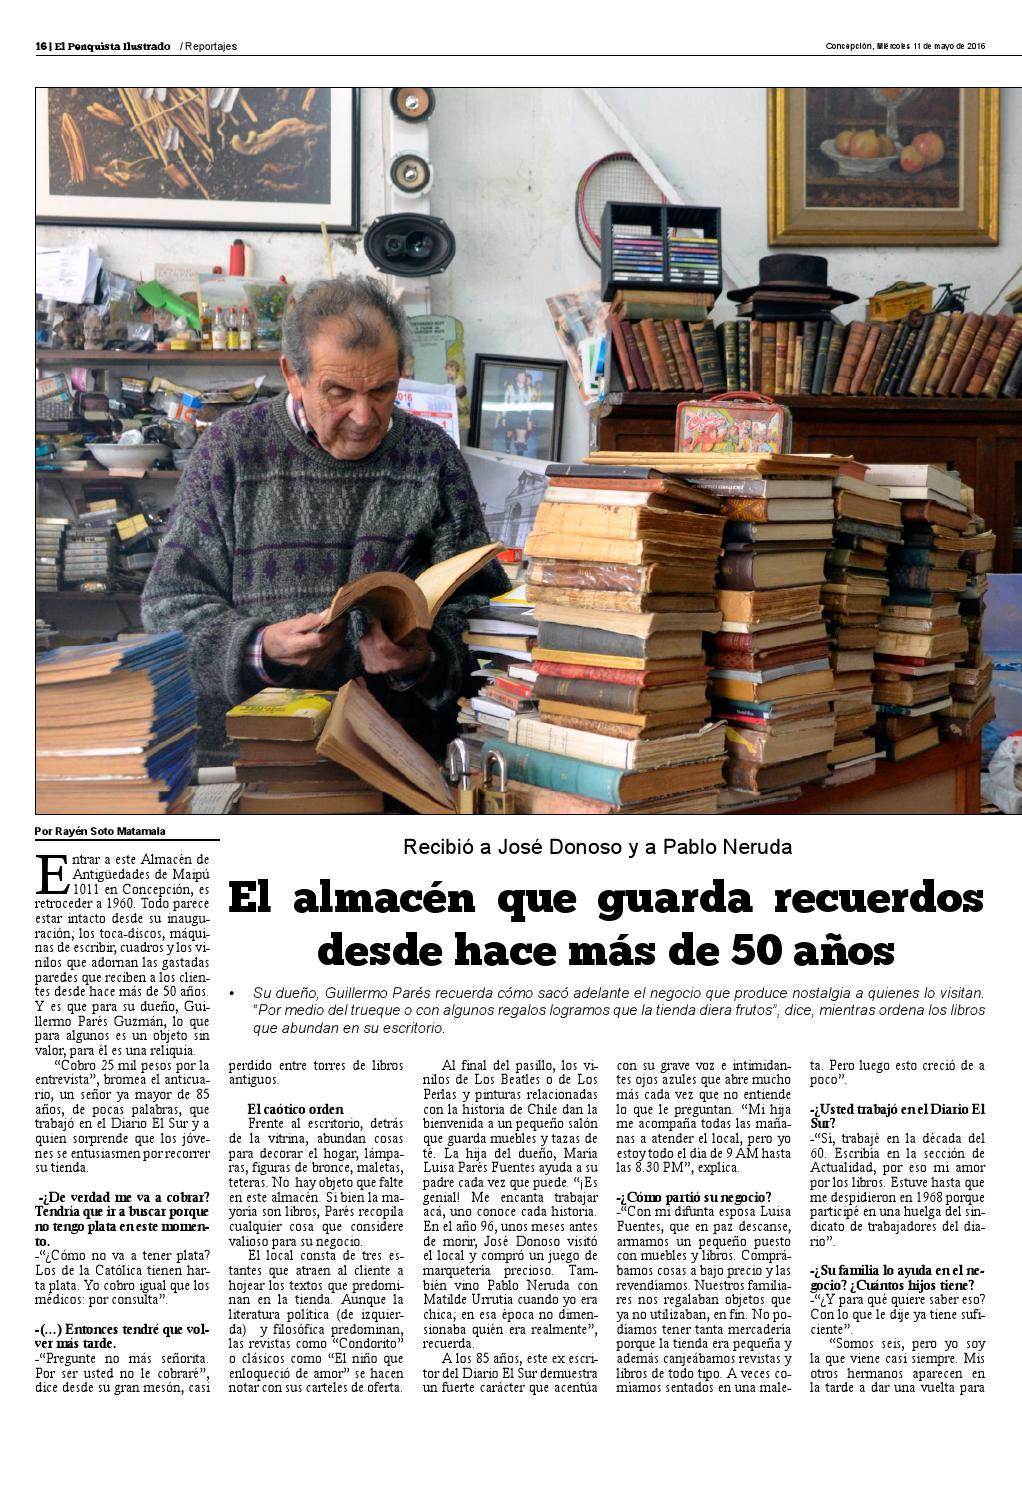 Muebles Rayen Concepcion - El Penquista Ilustrado Edici N N 123 A O 5 By Universidad [mjhdah]https://www.cafehelios.com/wp-content/uploads/2018/01/Cromados-Temucrom.jpg